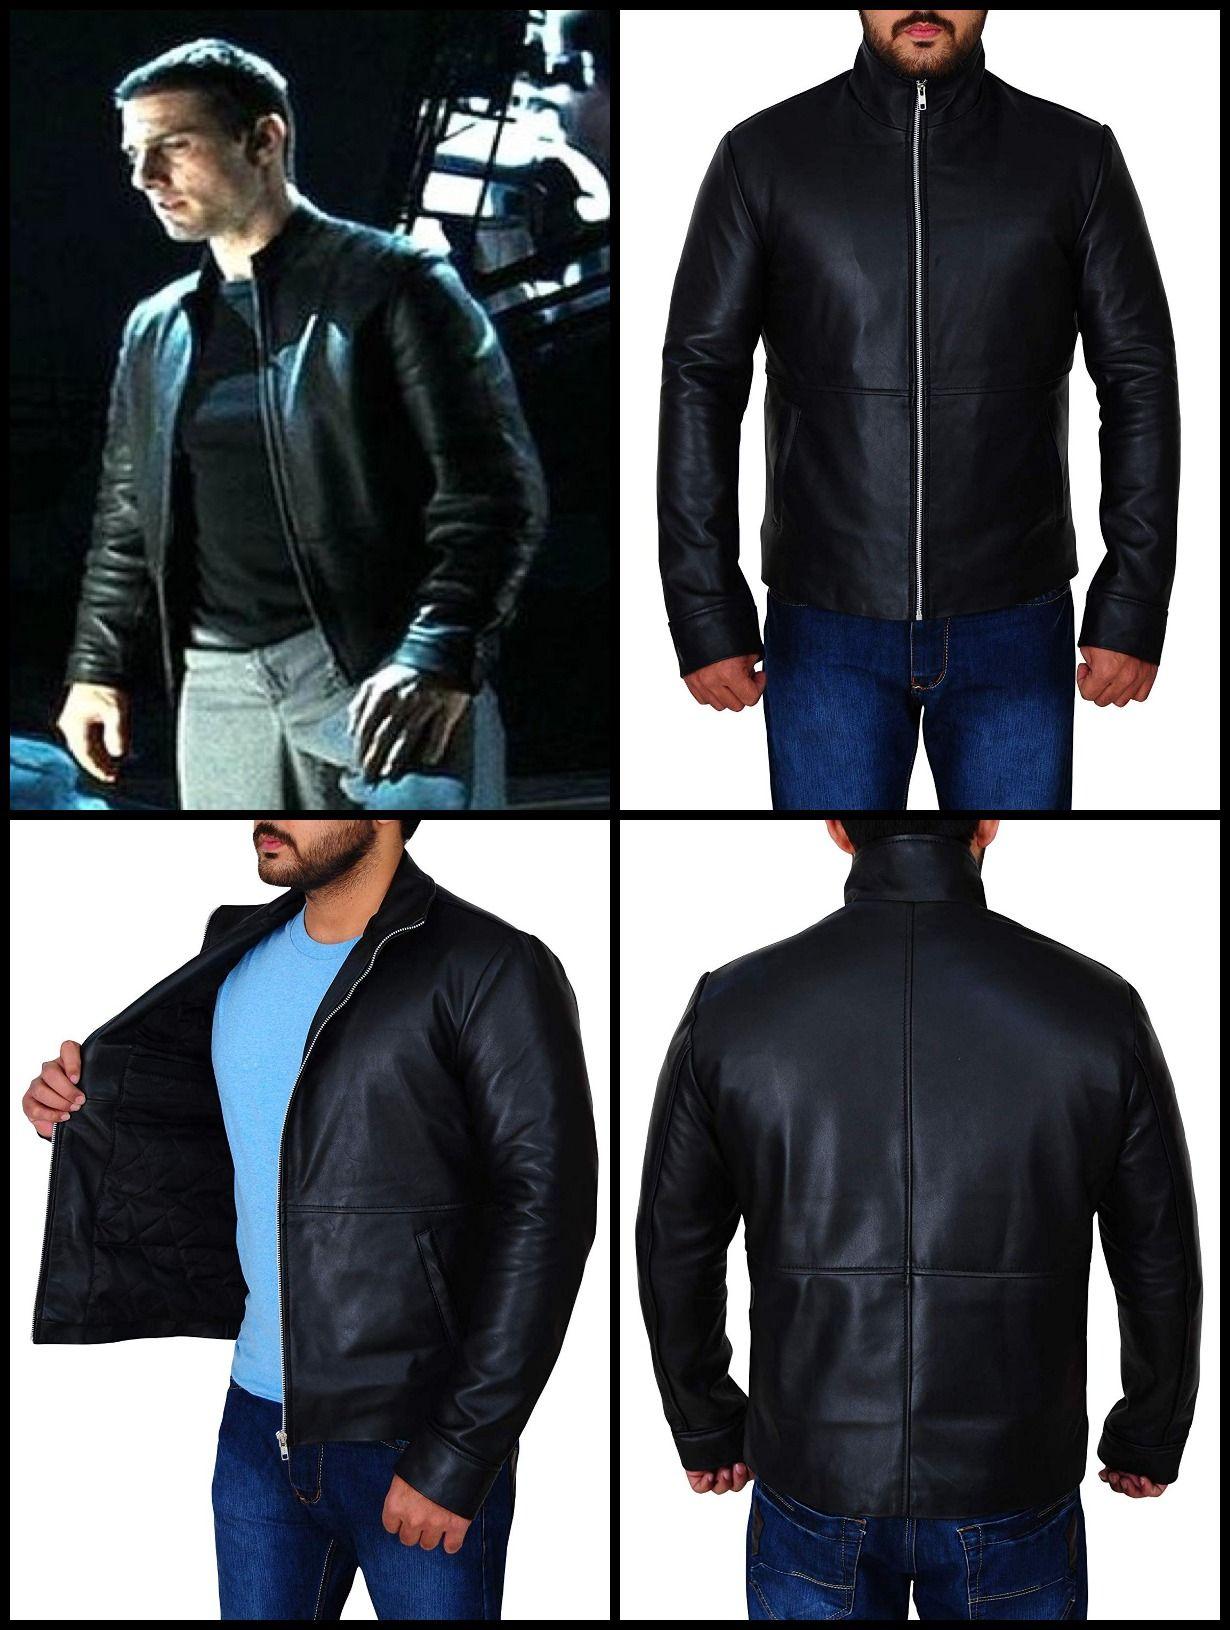 Tom Cruise Minority Report Chief John Anderton Jacket Jackets Leather Jacket Black Toms [ 1630 x 1230 Pixel ]